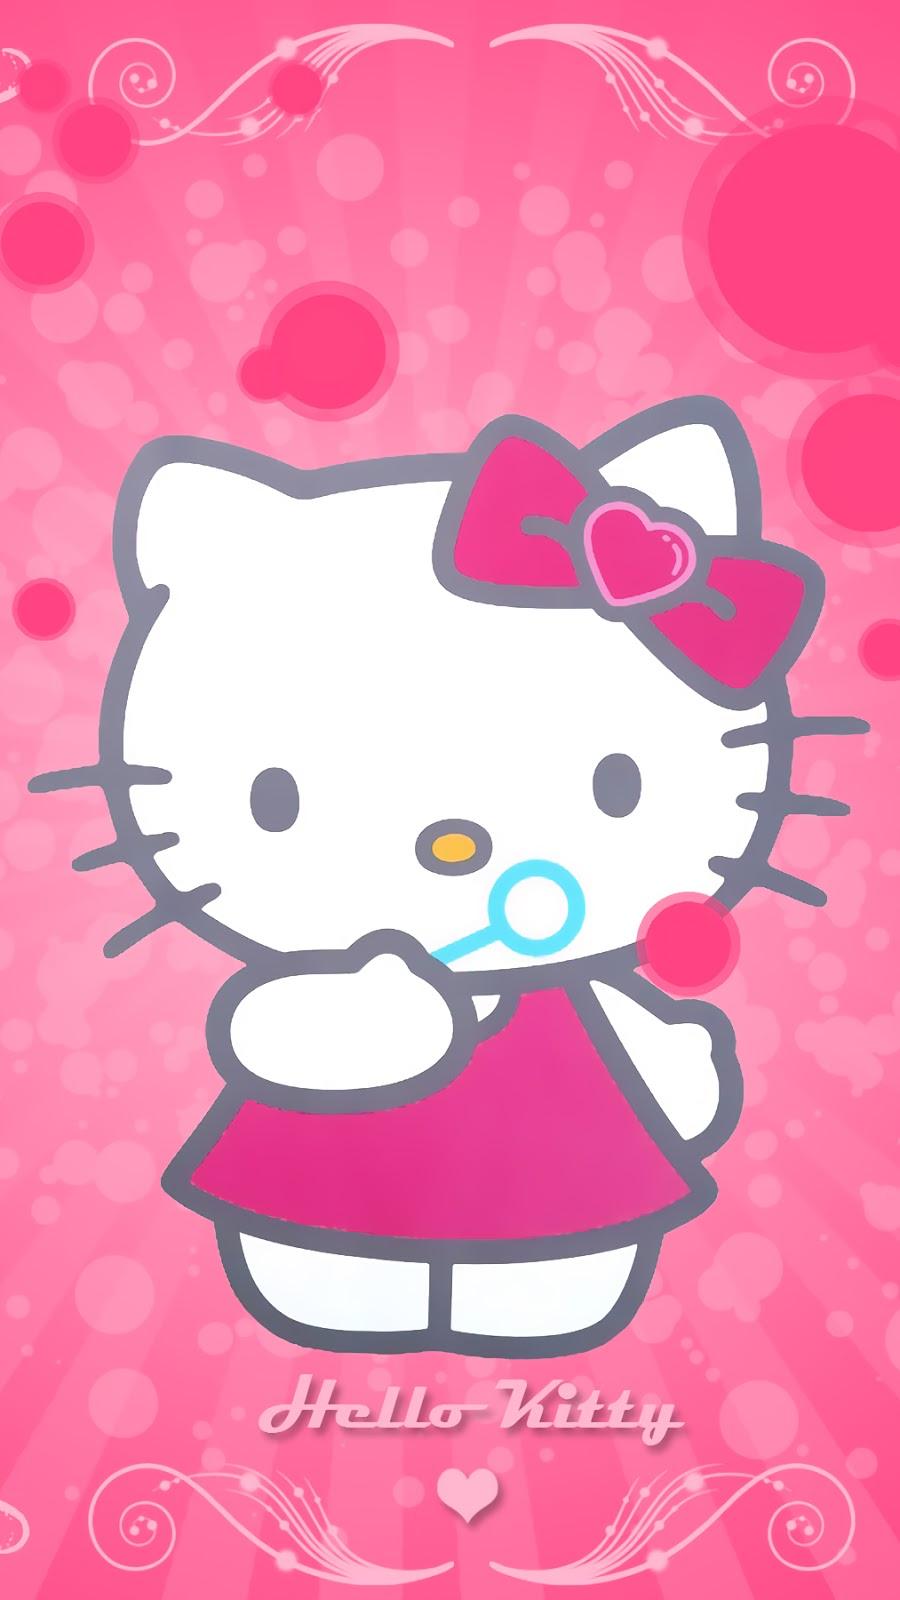 Top Wallpaper Hello Kitty Diamond - wallpaper%2Bandroid%2Bhello%2Bkitty%2B%25288%2529  Graphic_96564.jpg